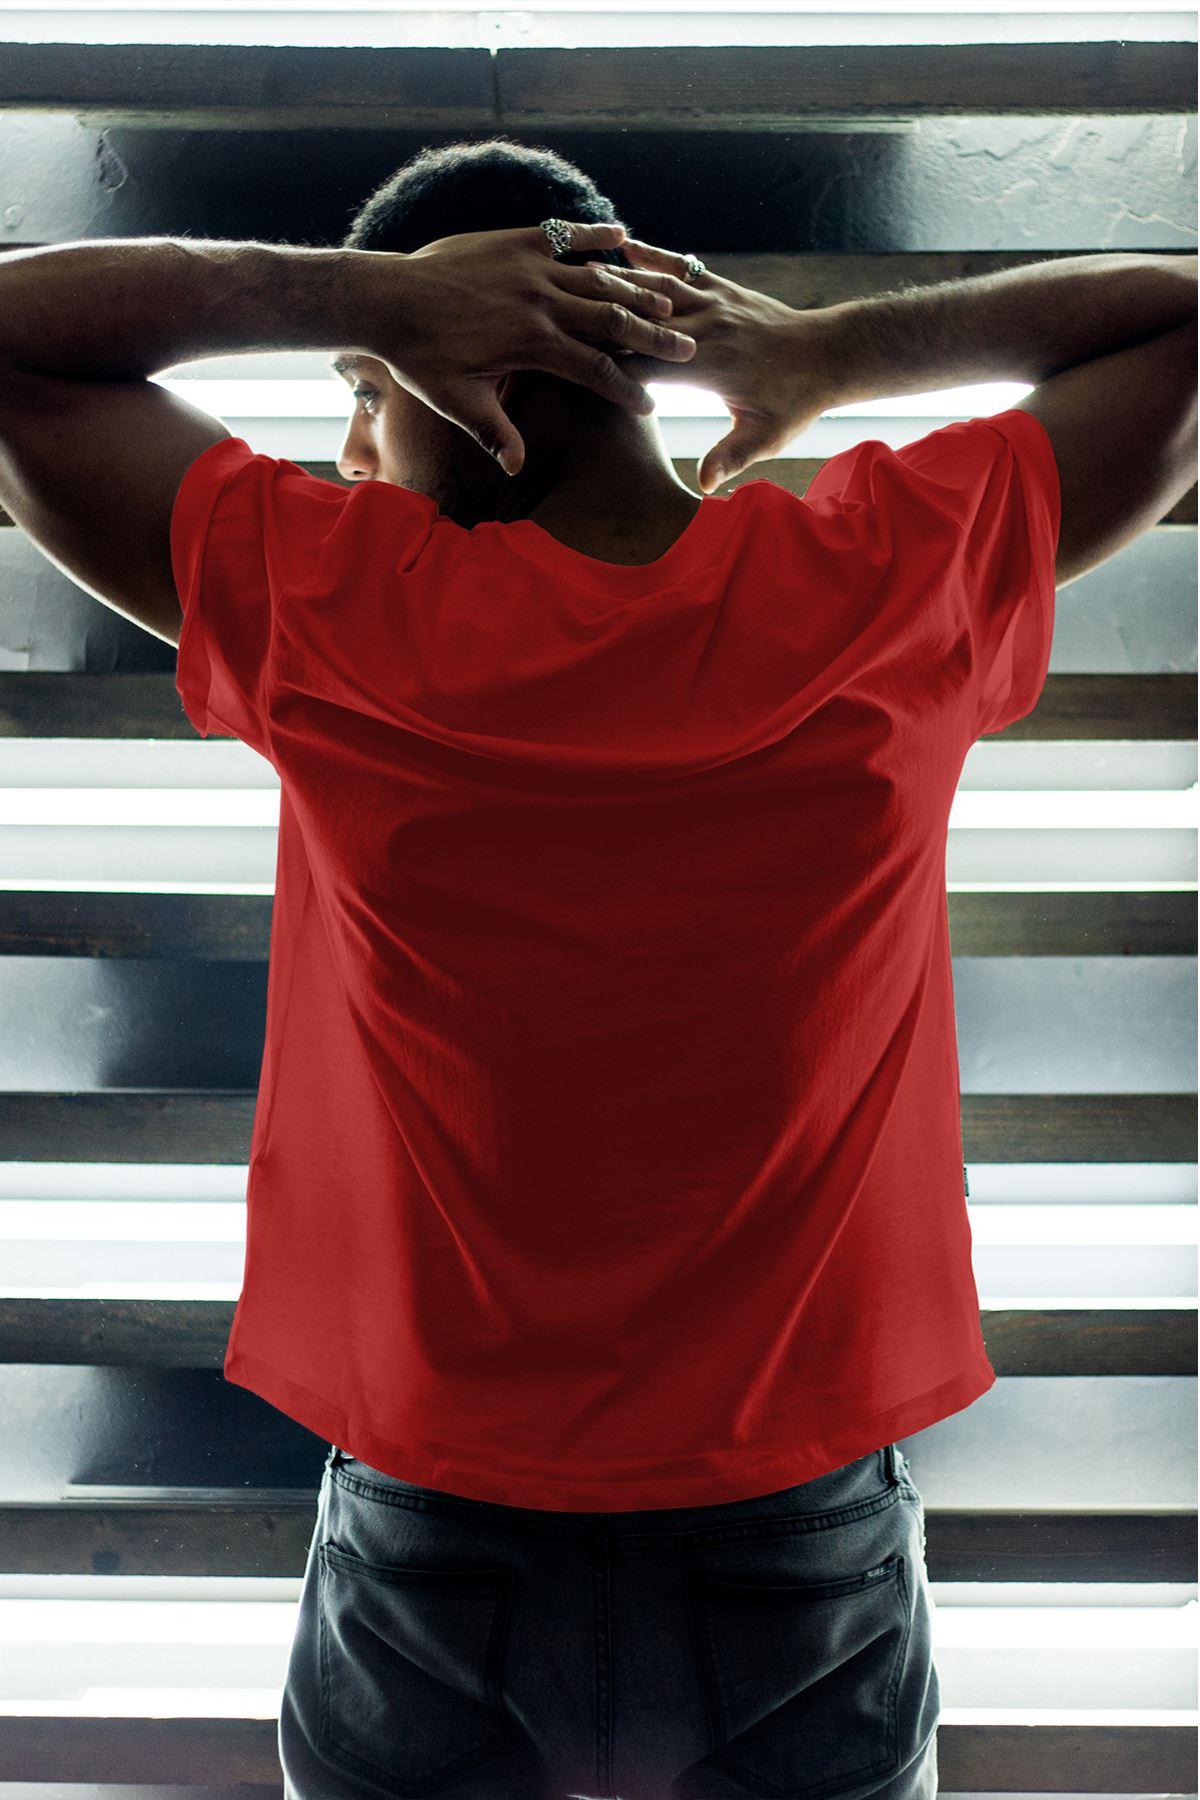 Miami Heat 165 Kırmızı Erkek Oversize Tshirt - Tişört